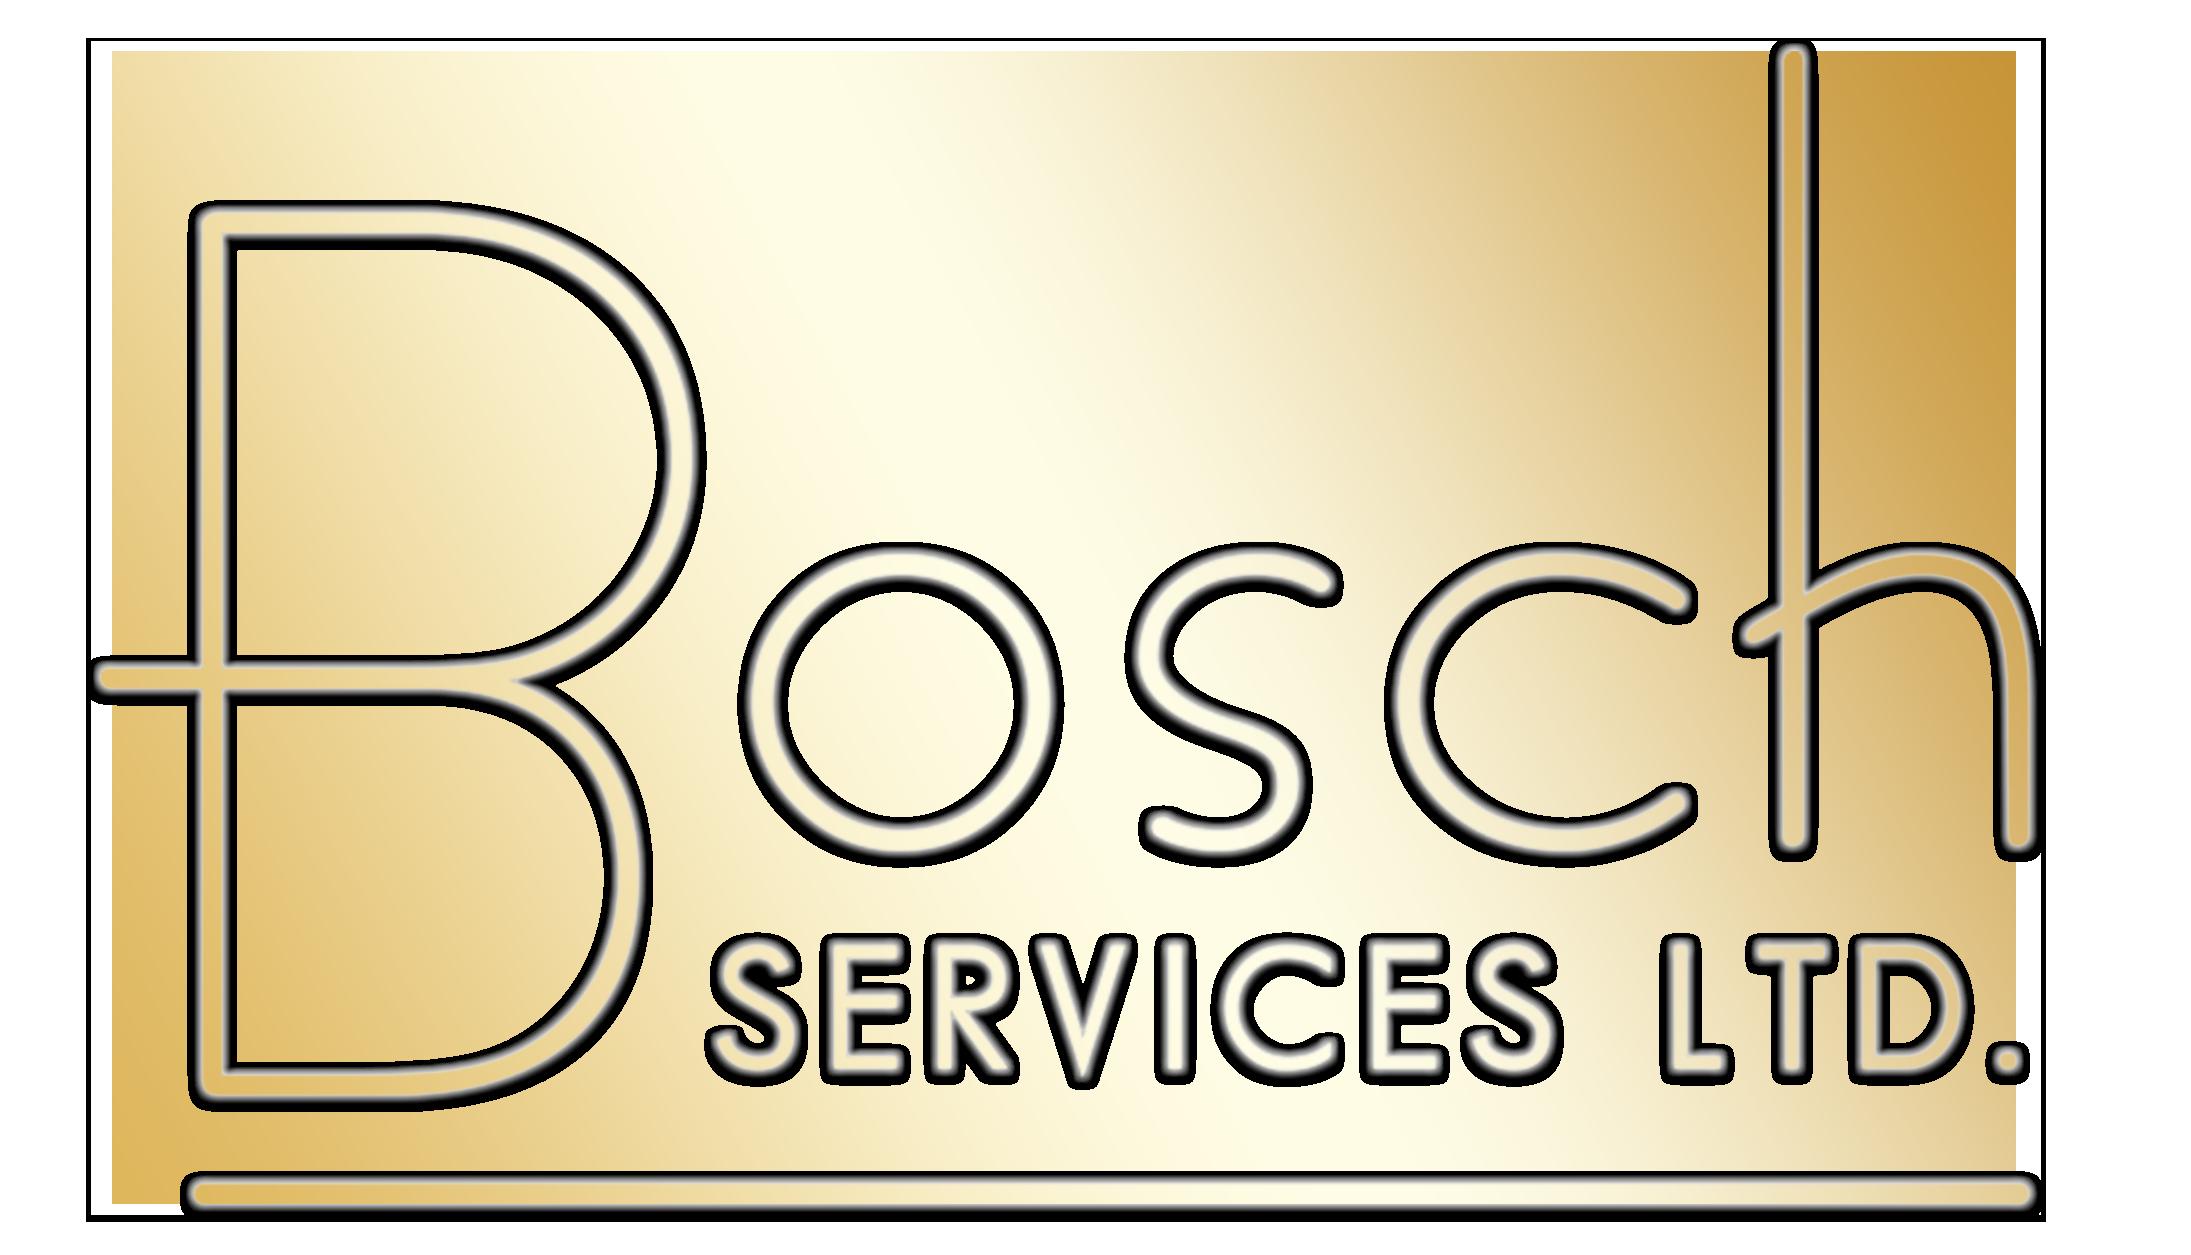 bosch-shiny3.png